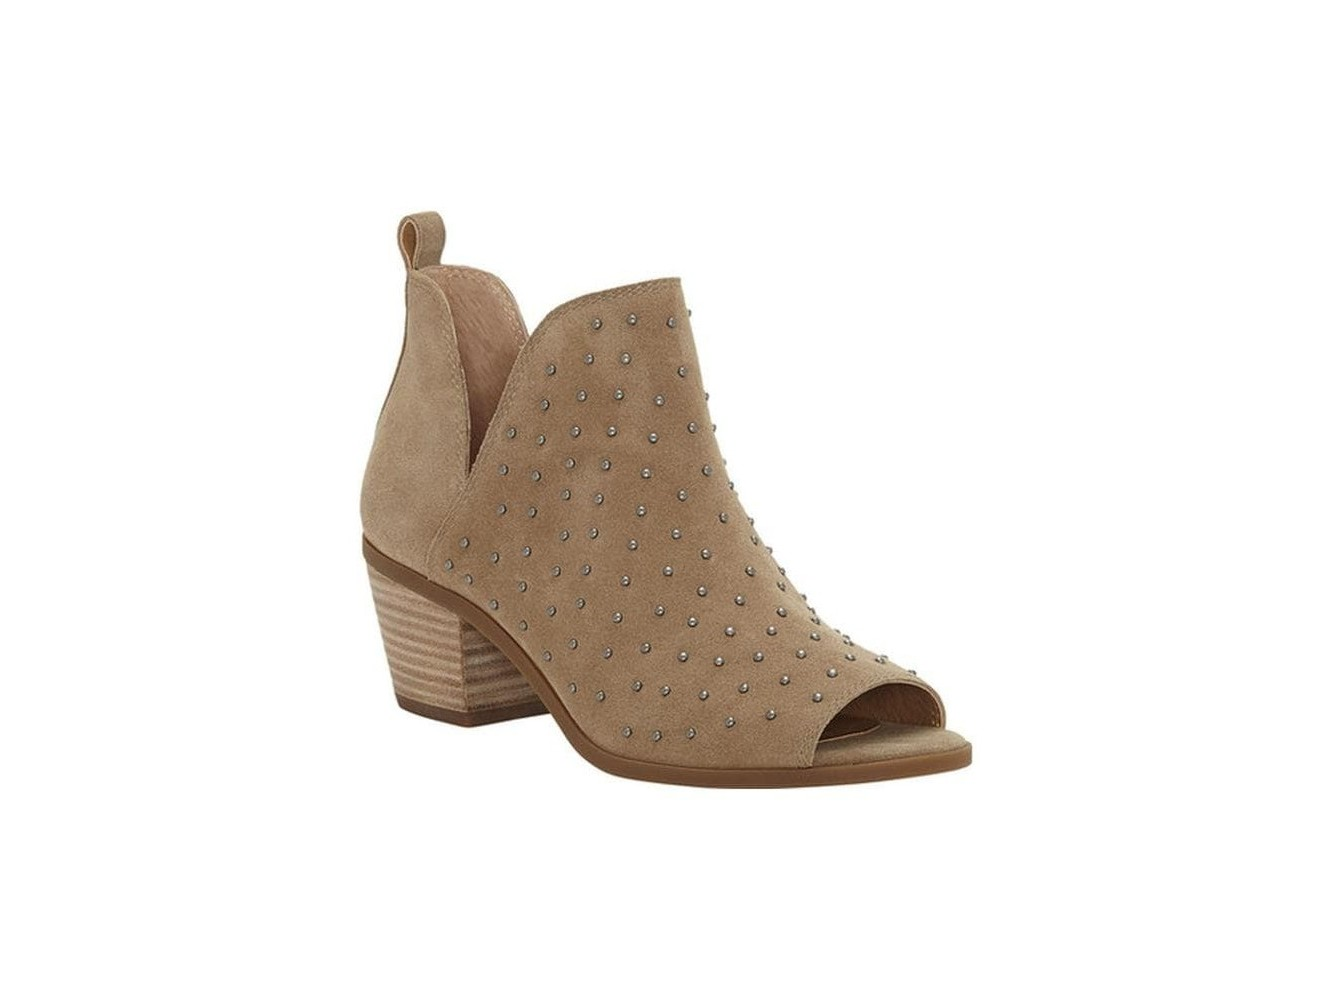 a75f9a166f6c Lucky Brand Womens Barlenna Leather Peep Toe Ankle